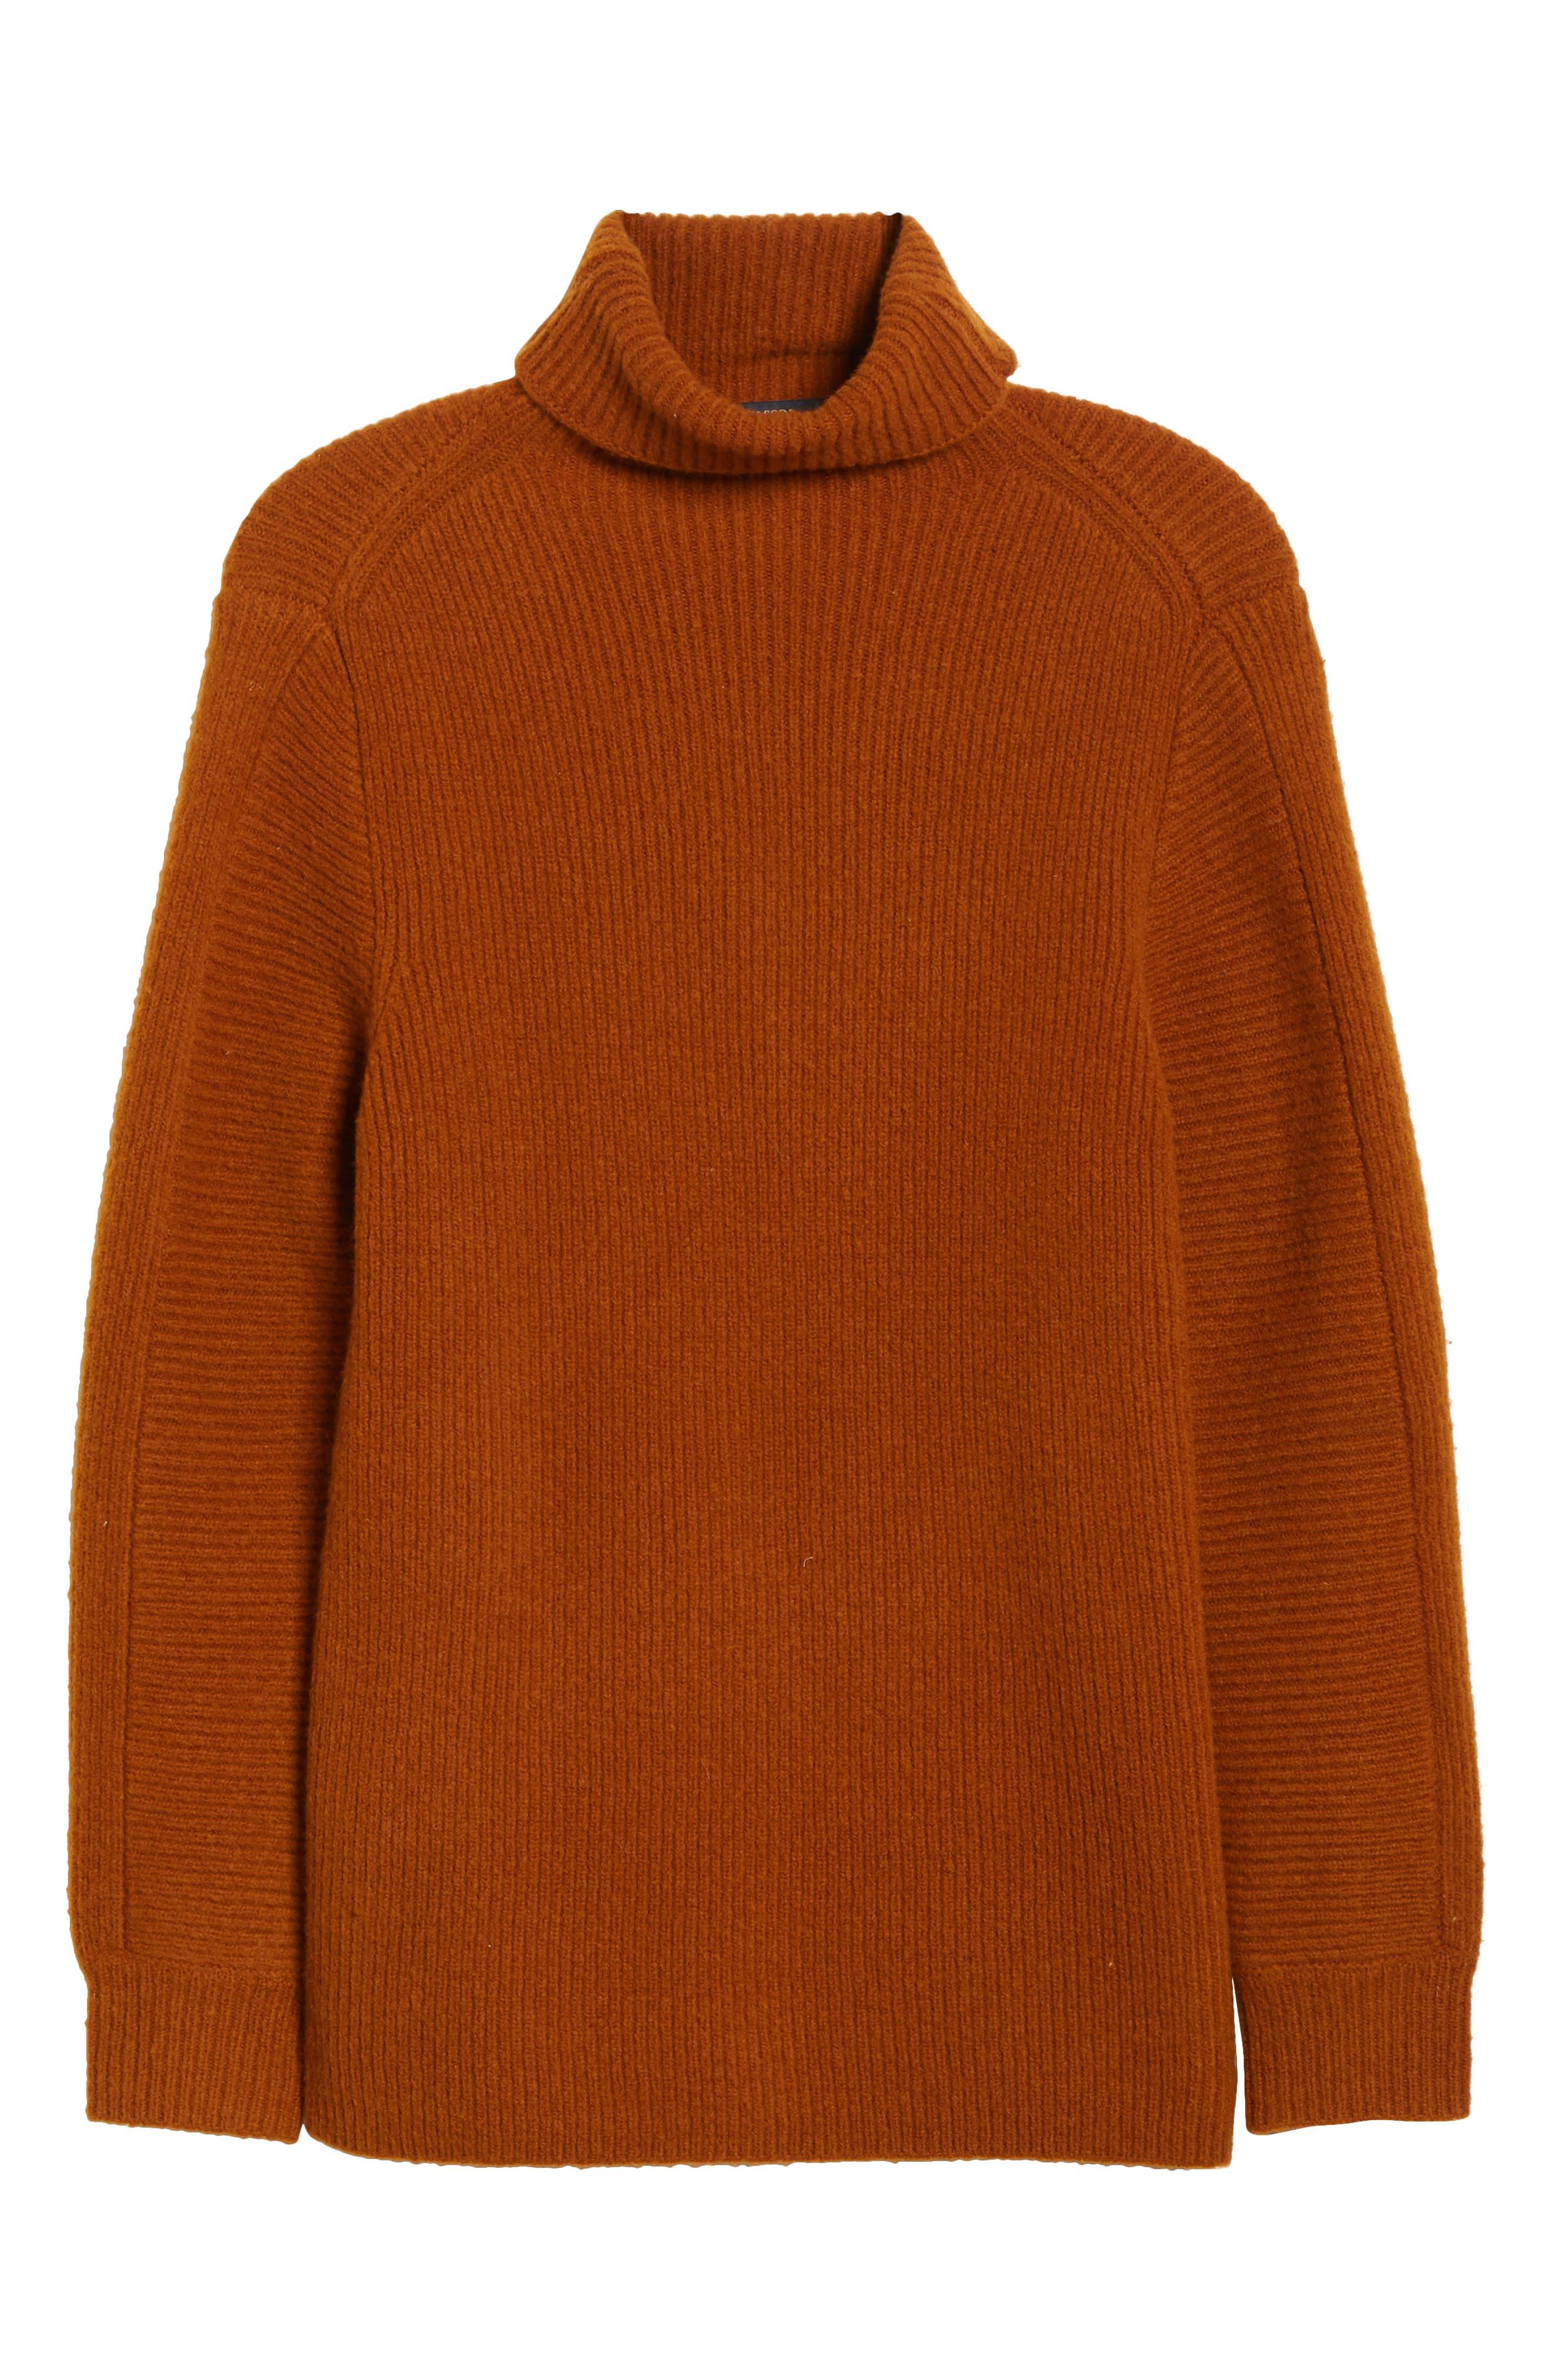 Wool Blend Turtleneck Sweater,                             Alternate thumbnail 6, color,                             RUSSET BROWN